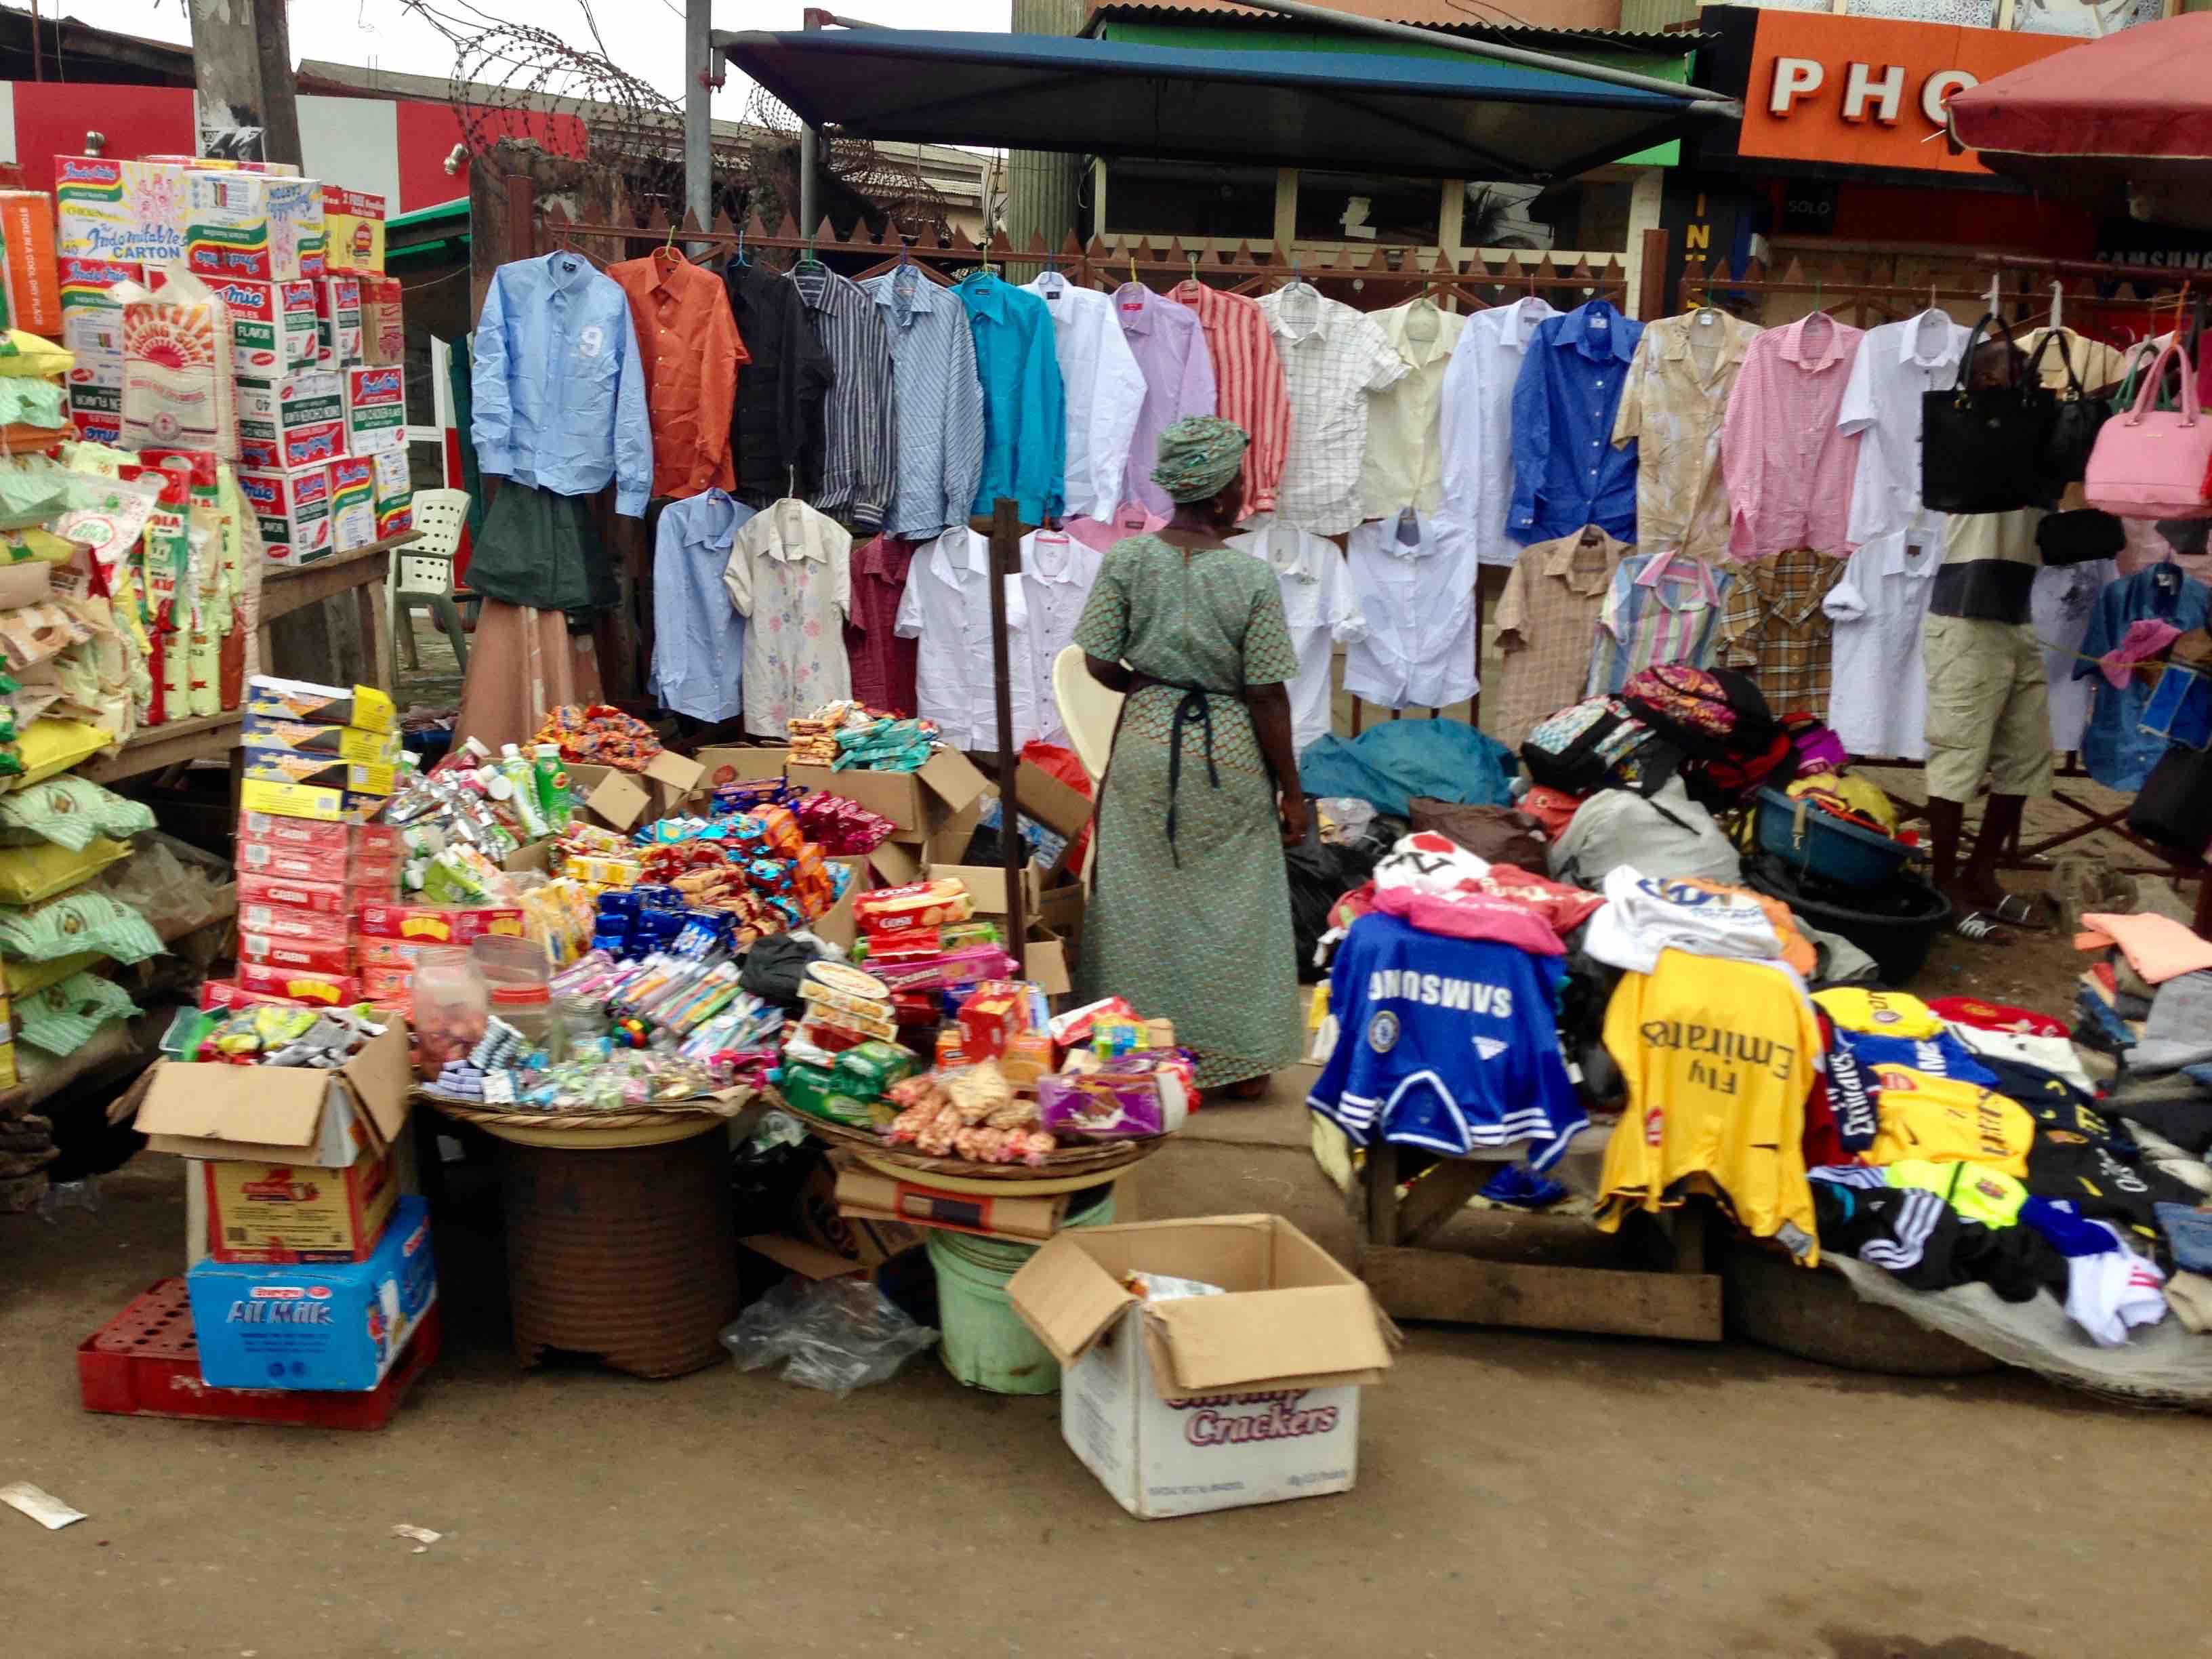 Street market scene, Lagos, Lagos State, Nigeria, #JujuFilms